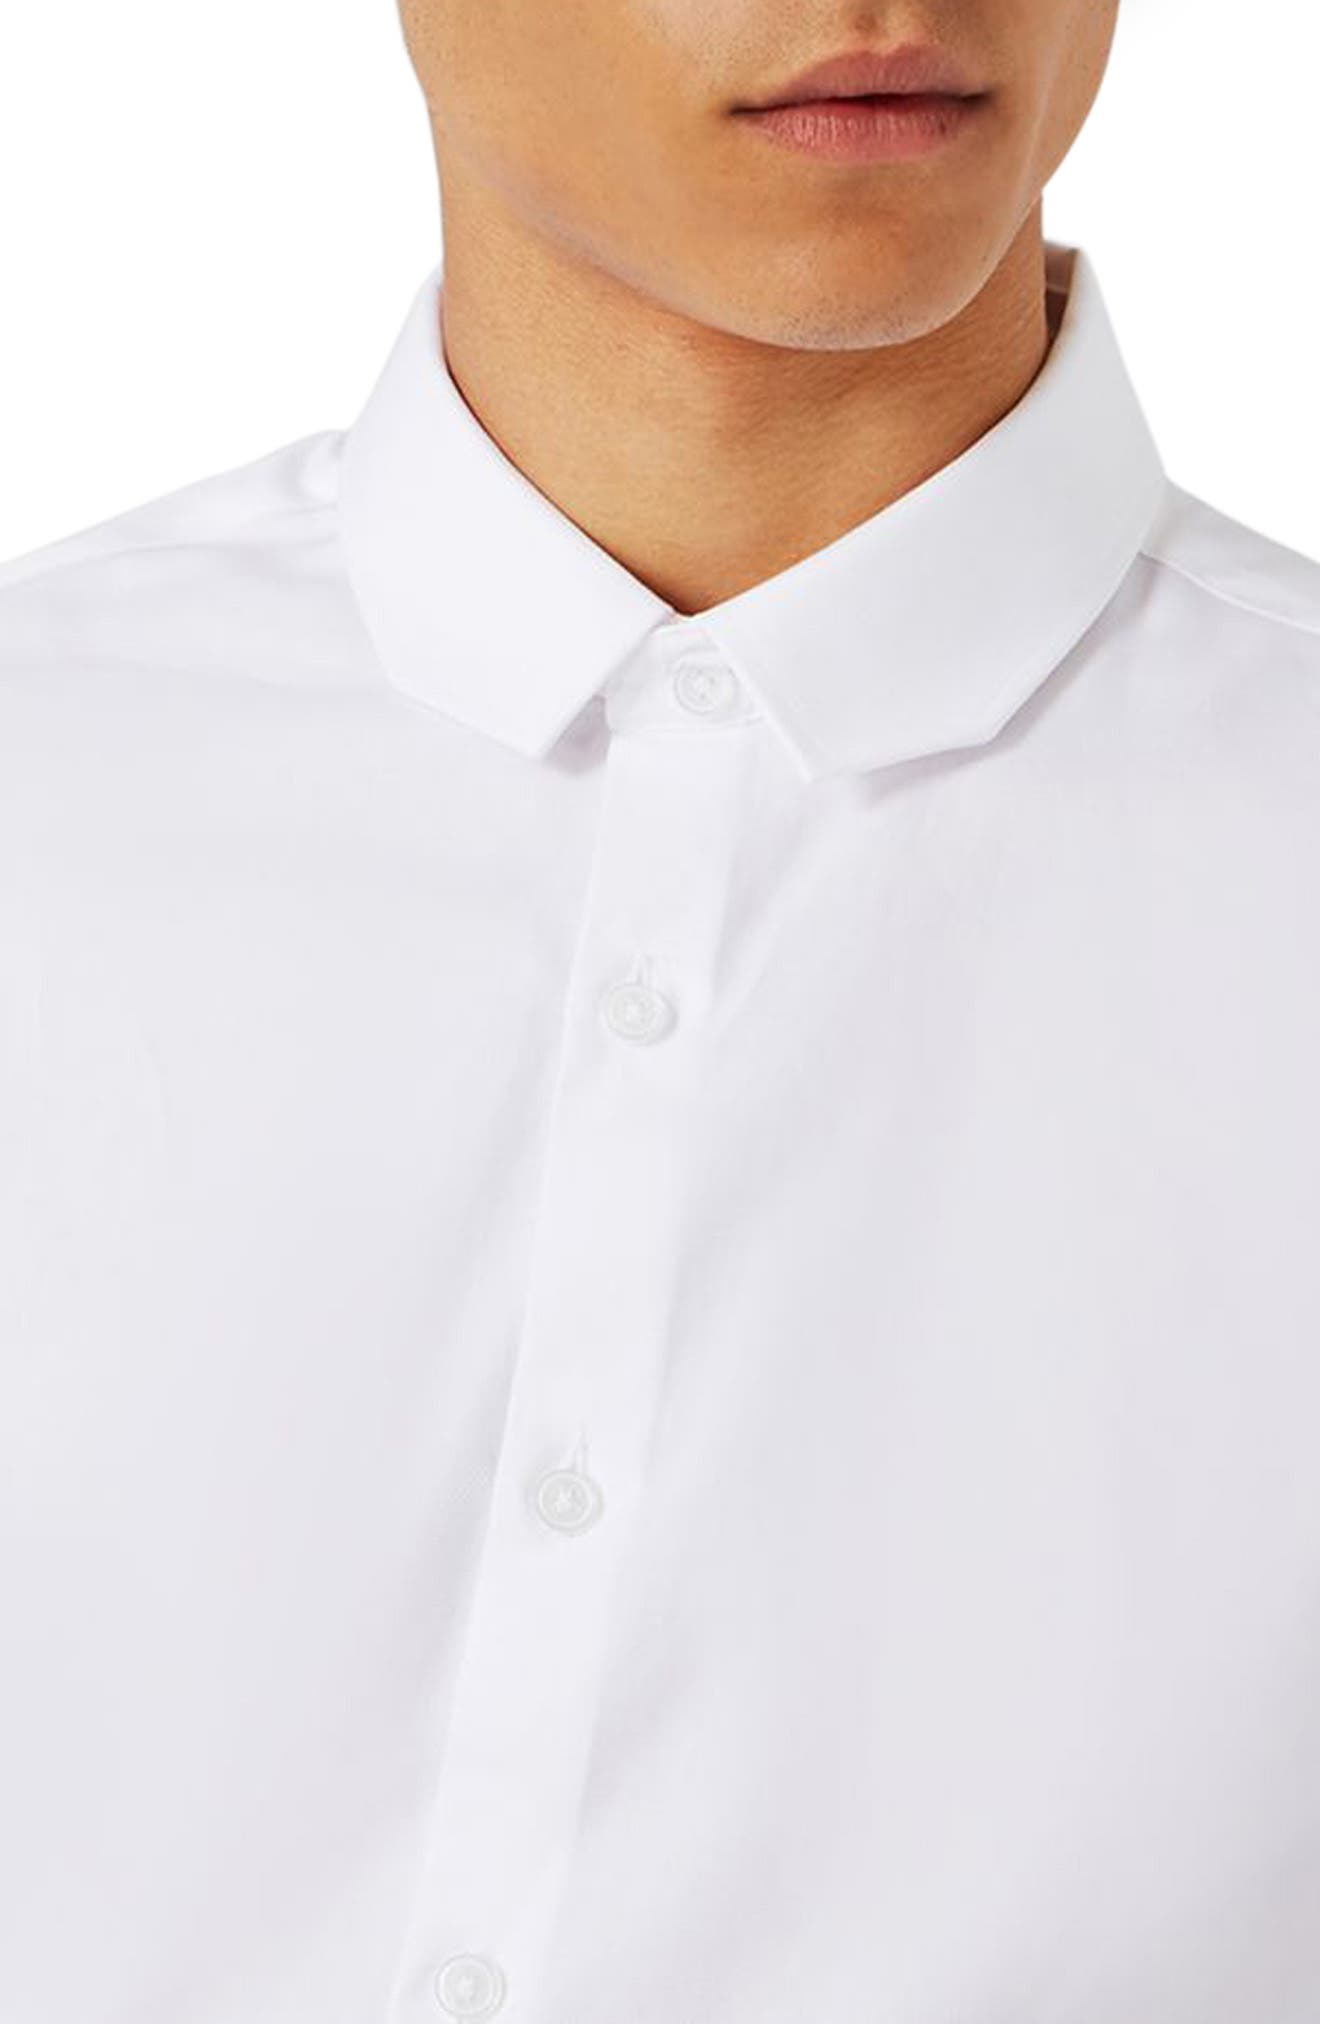 Trim Fit Chisel Collar Dress Shirt,                             Alternate thumbnail 4, color,                             White